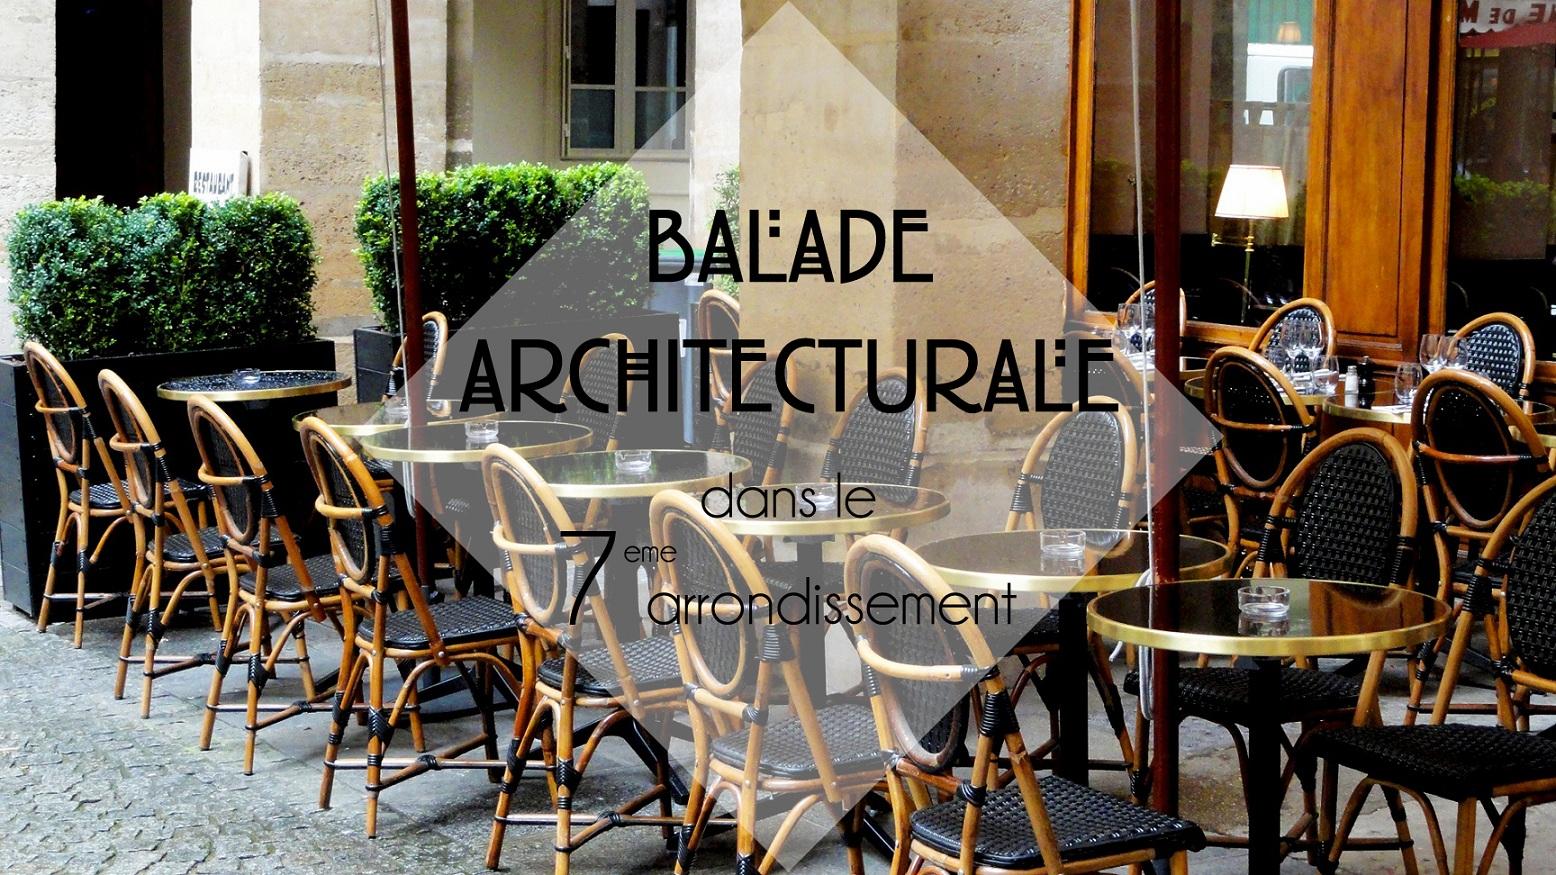 balade_architecturale-7e_V2